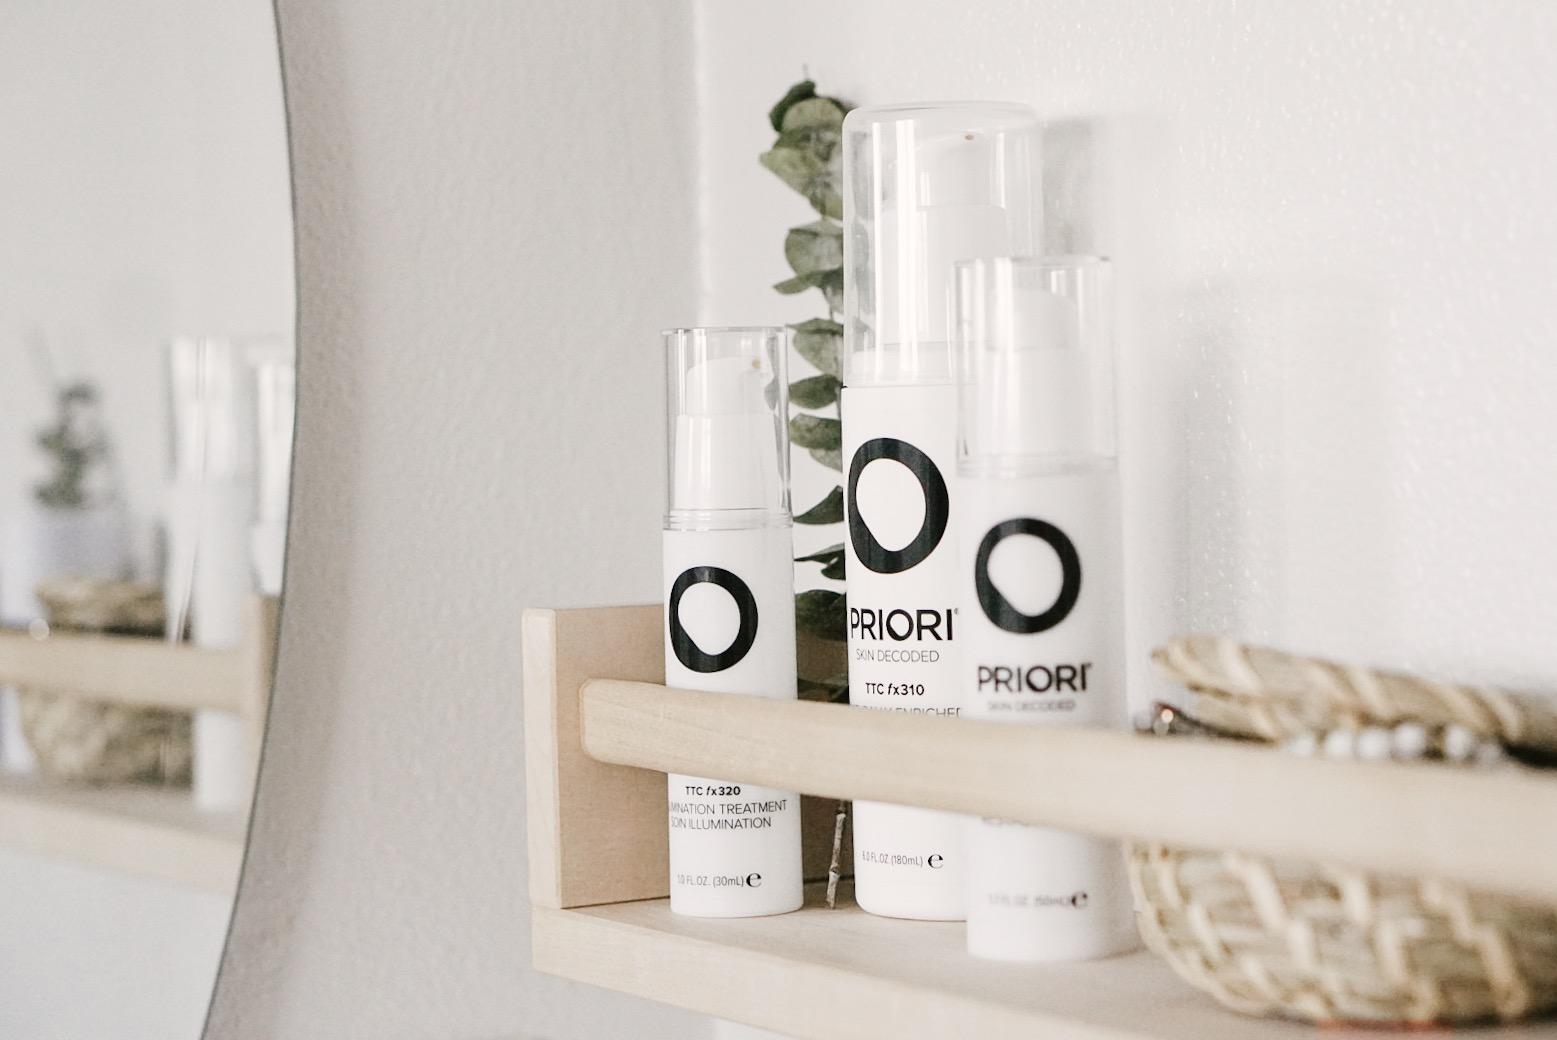 priori skincare non toxic turmeric based facewash.JPG